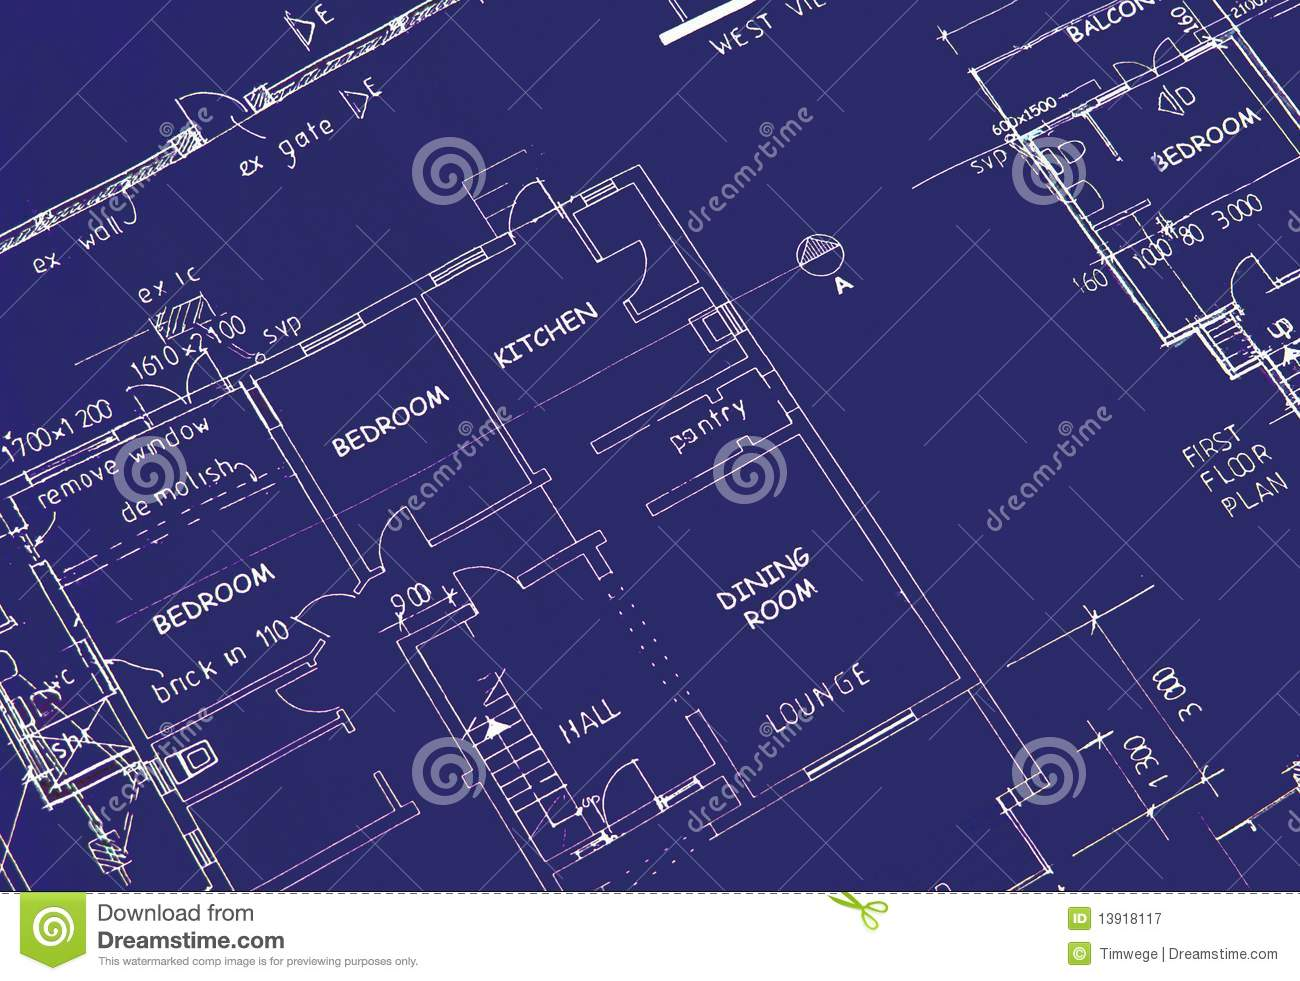 Blueprint house plans modern house house blueprint house plans 82960 malvernweather Choice Image